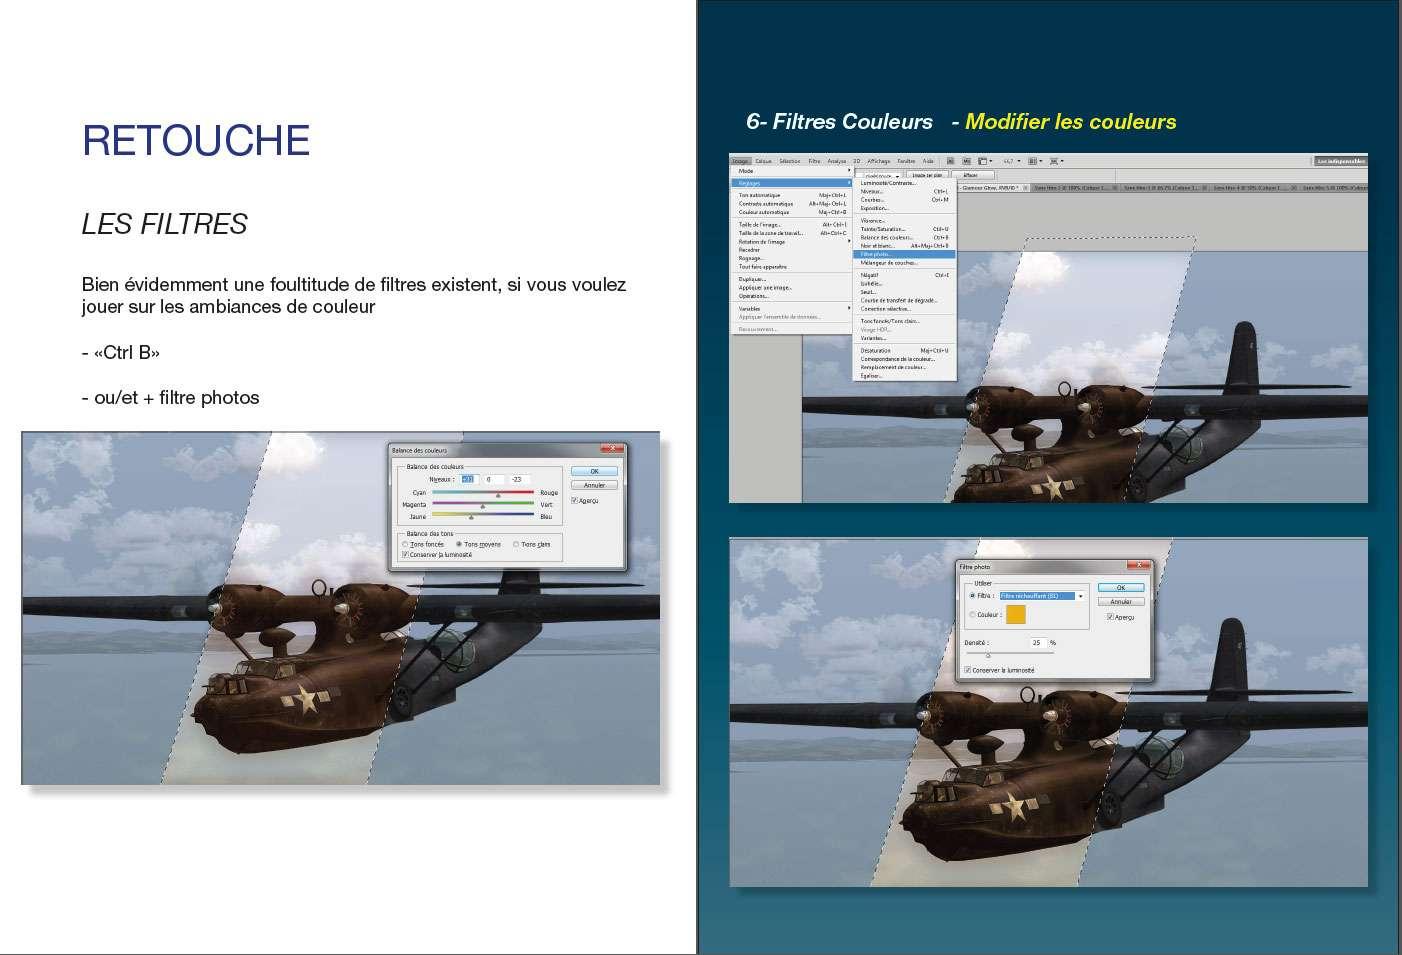 http://img269.imageshack.us/img269/5593/tutoretouche101.jpg